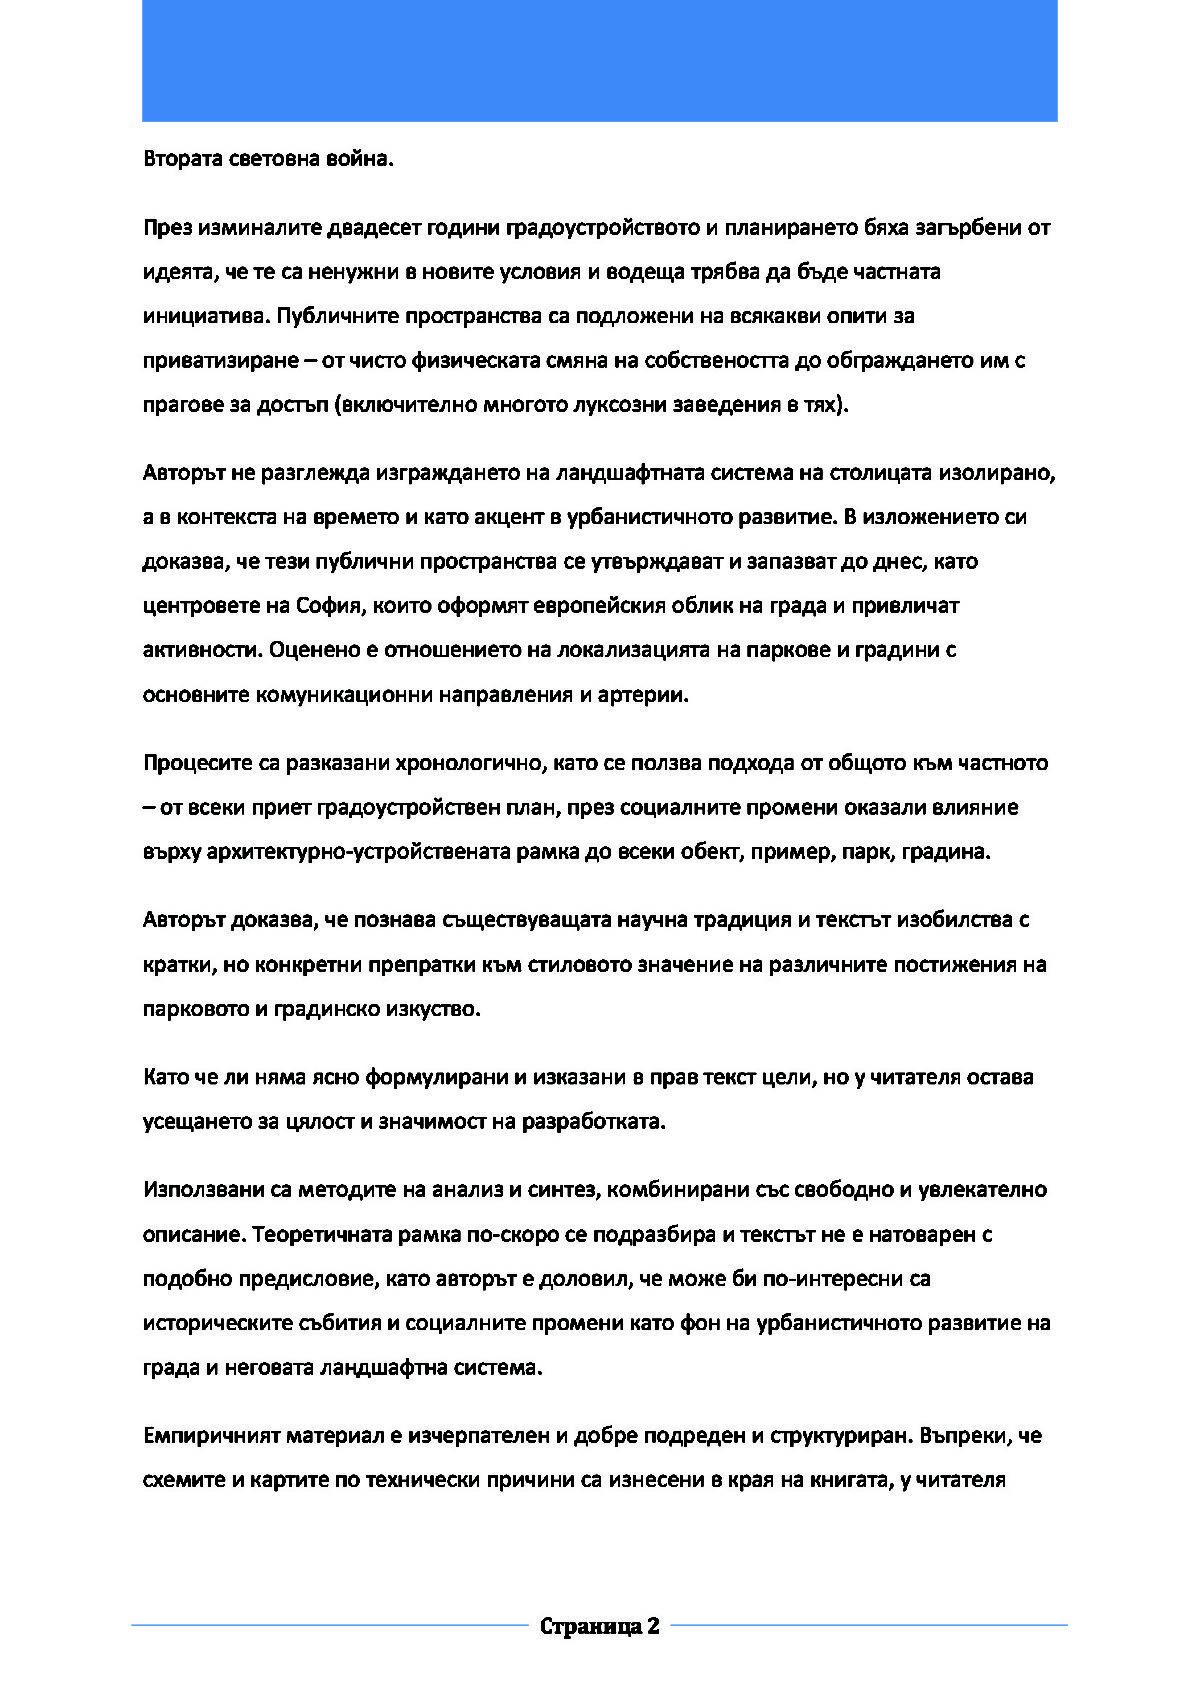 http://www.petkovstudio.com/bg/wp-content/uploads/2011/02/istoriq_na_grada_Page_3-1200x1697.jpg